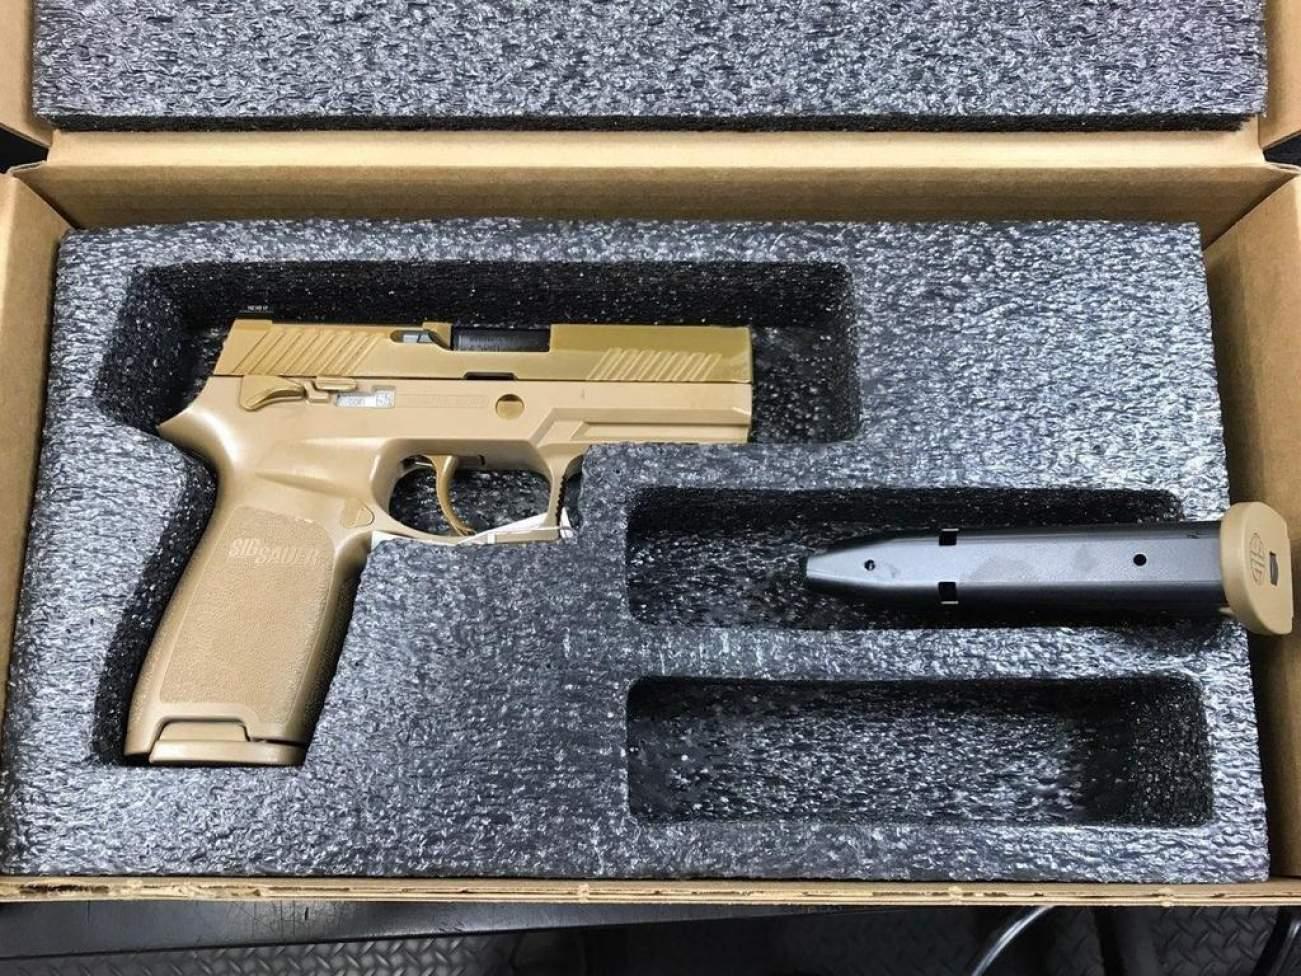 The U.S. Army Just Got New Sig Sauer M17 and M18 Handguns